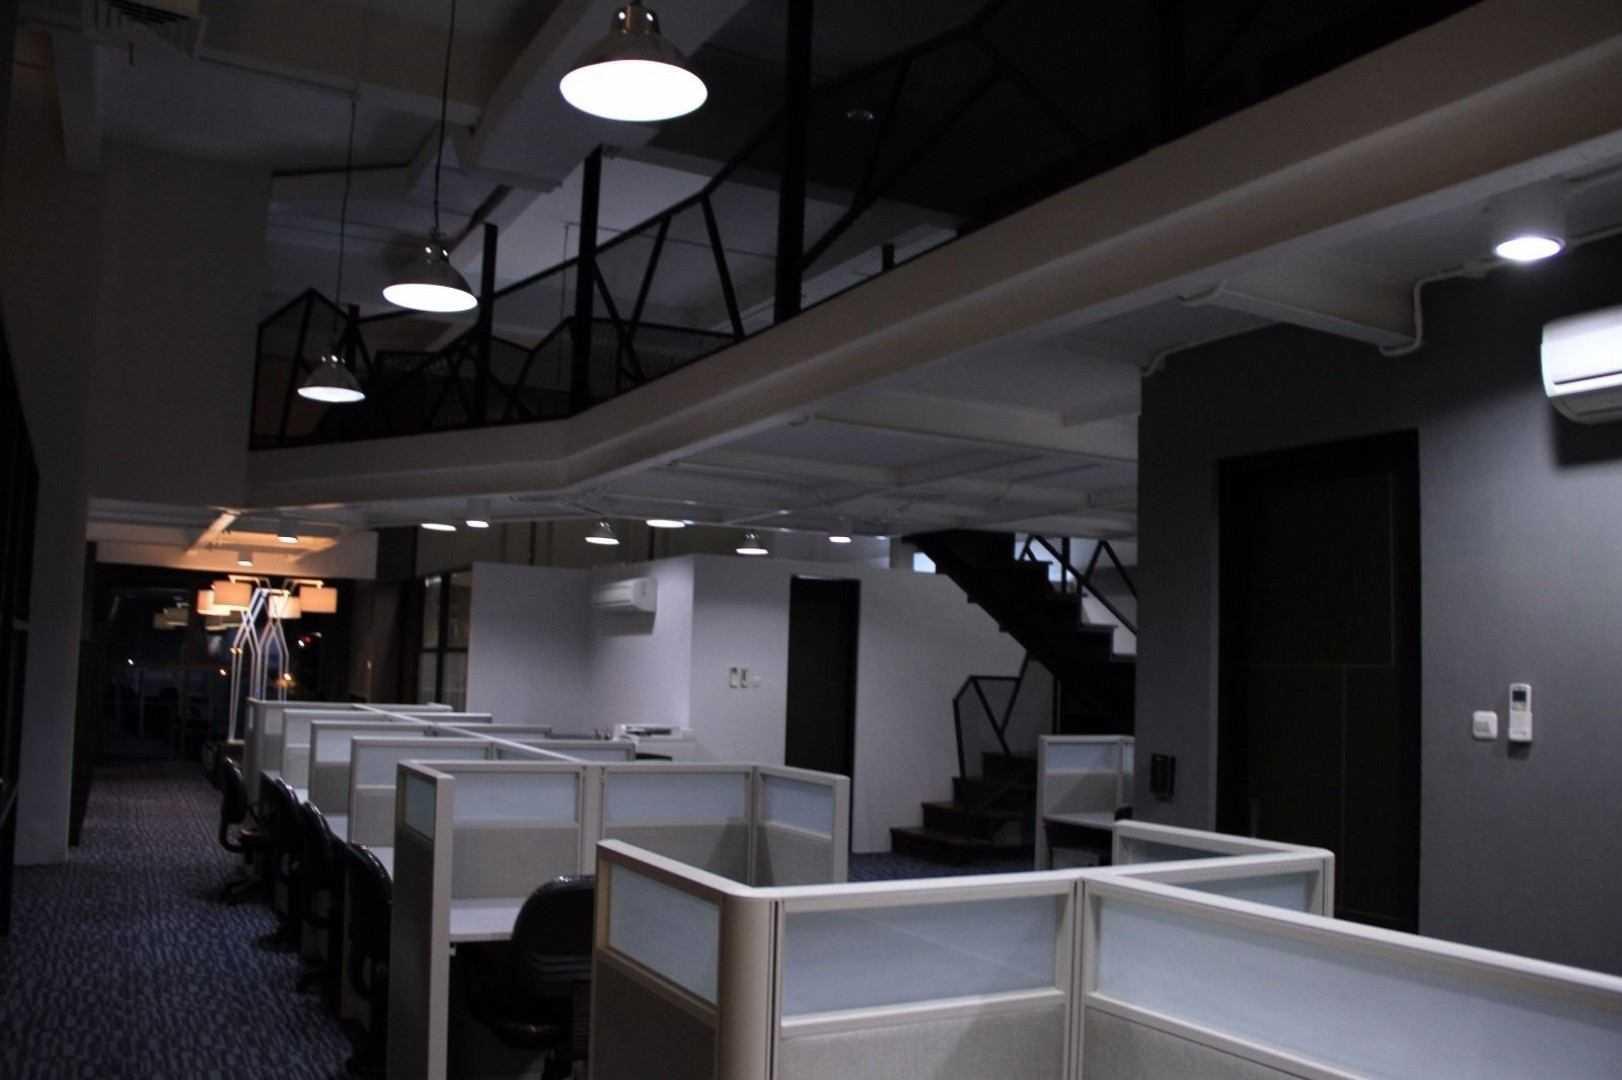 Kottagaris Interior Design Consultant Pt. Kreasi Teknologi Solusindo Surabaya, Kota Sby, Jawa Timur, Indonesia Surabaya, Kota Sby, Jawa Timur, Indonesia Working Area   54625